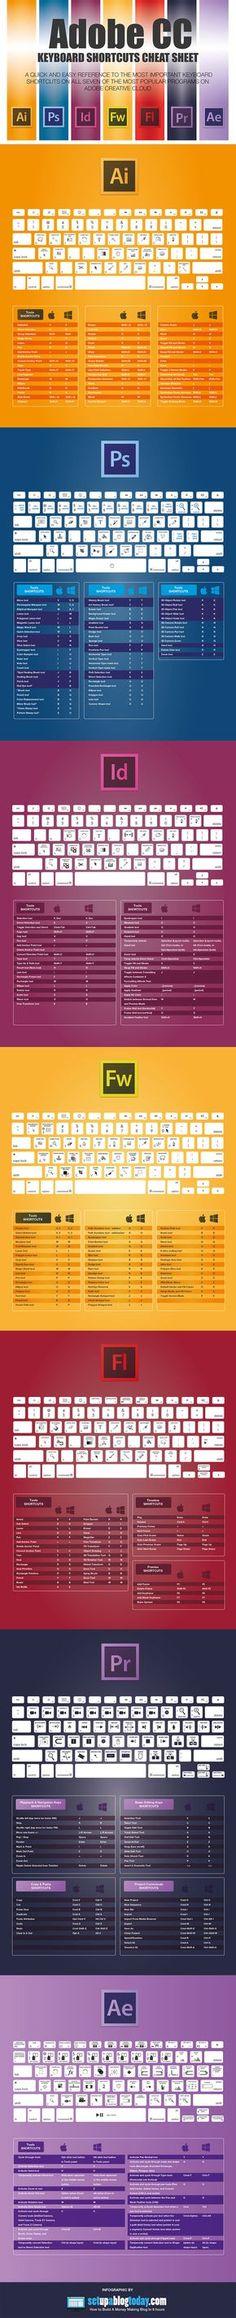 Infográfico traz + de 100 atalhos para os 7 principais programas da Adobe Creative Cloud.